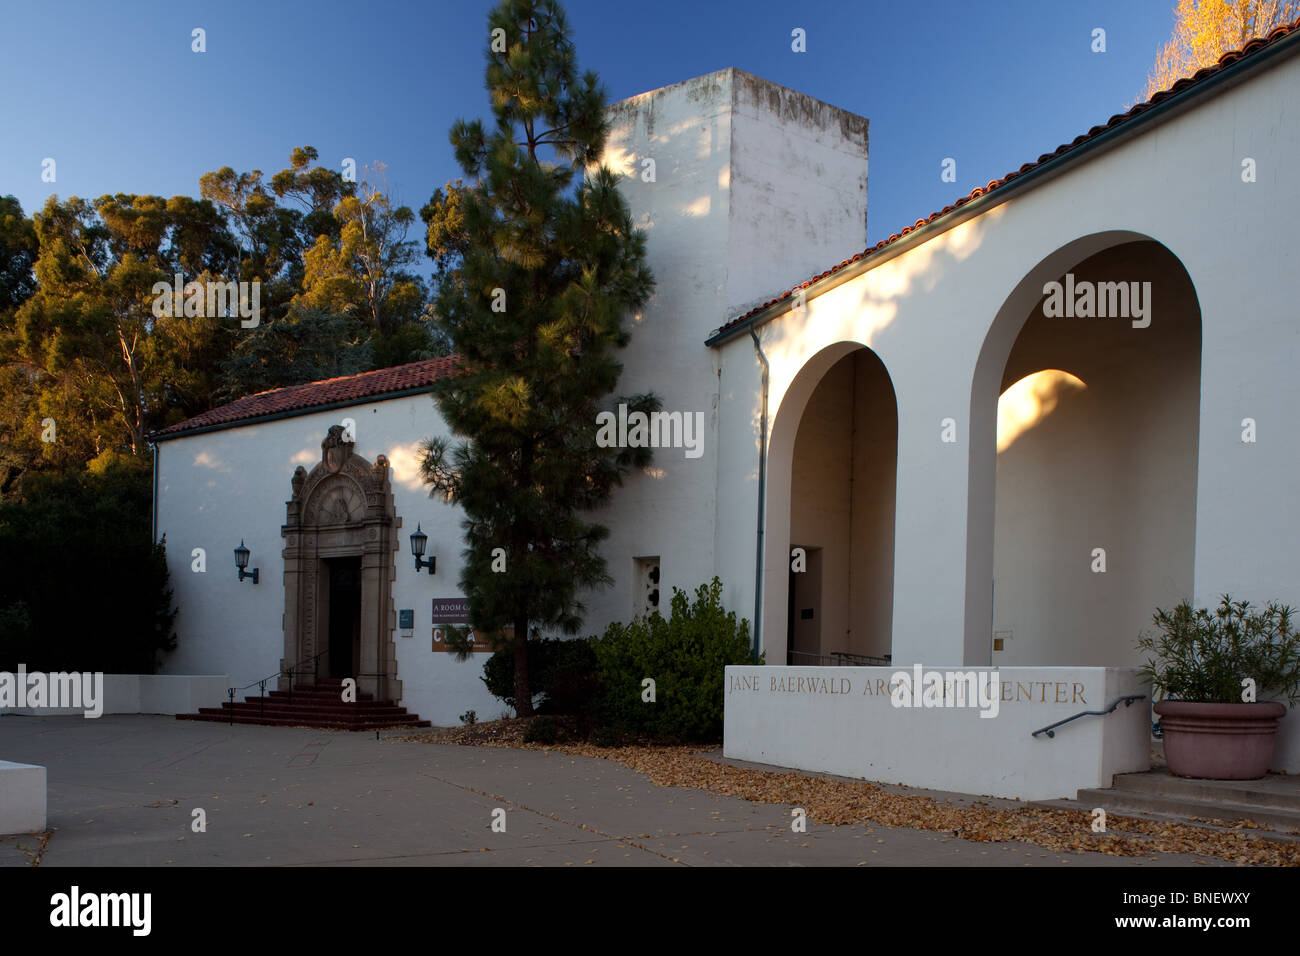 Jane Baerwald Aron Art Center at Mills College in Oakland CA. - Stock Image